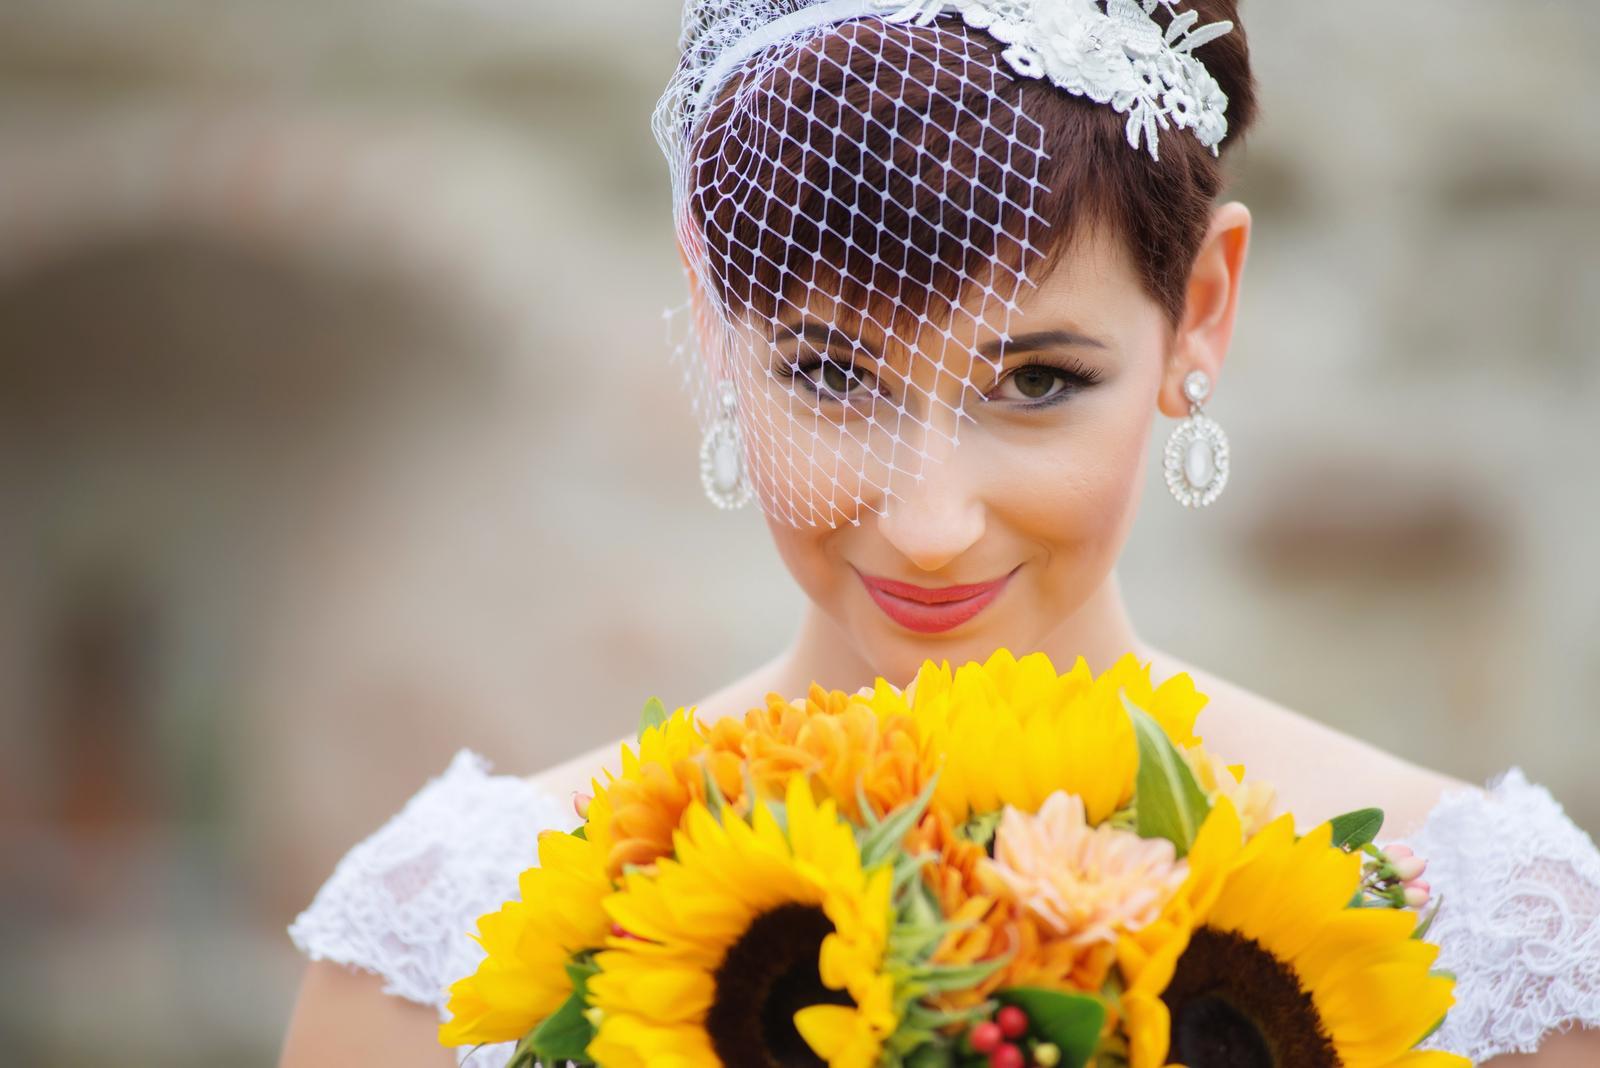 @sonrisa94 Vyberajte si fotografa... - Obrázok č. 1